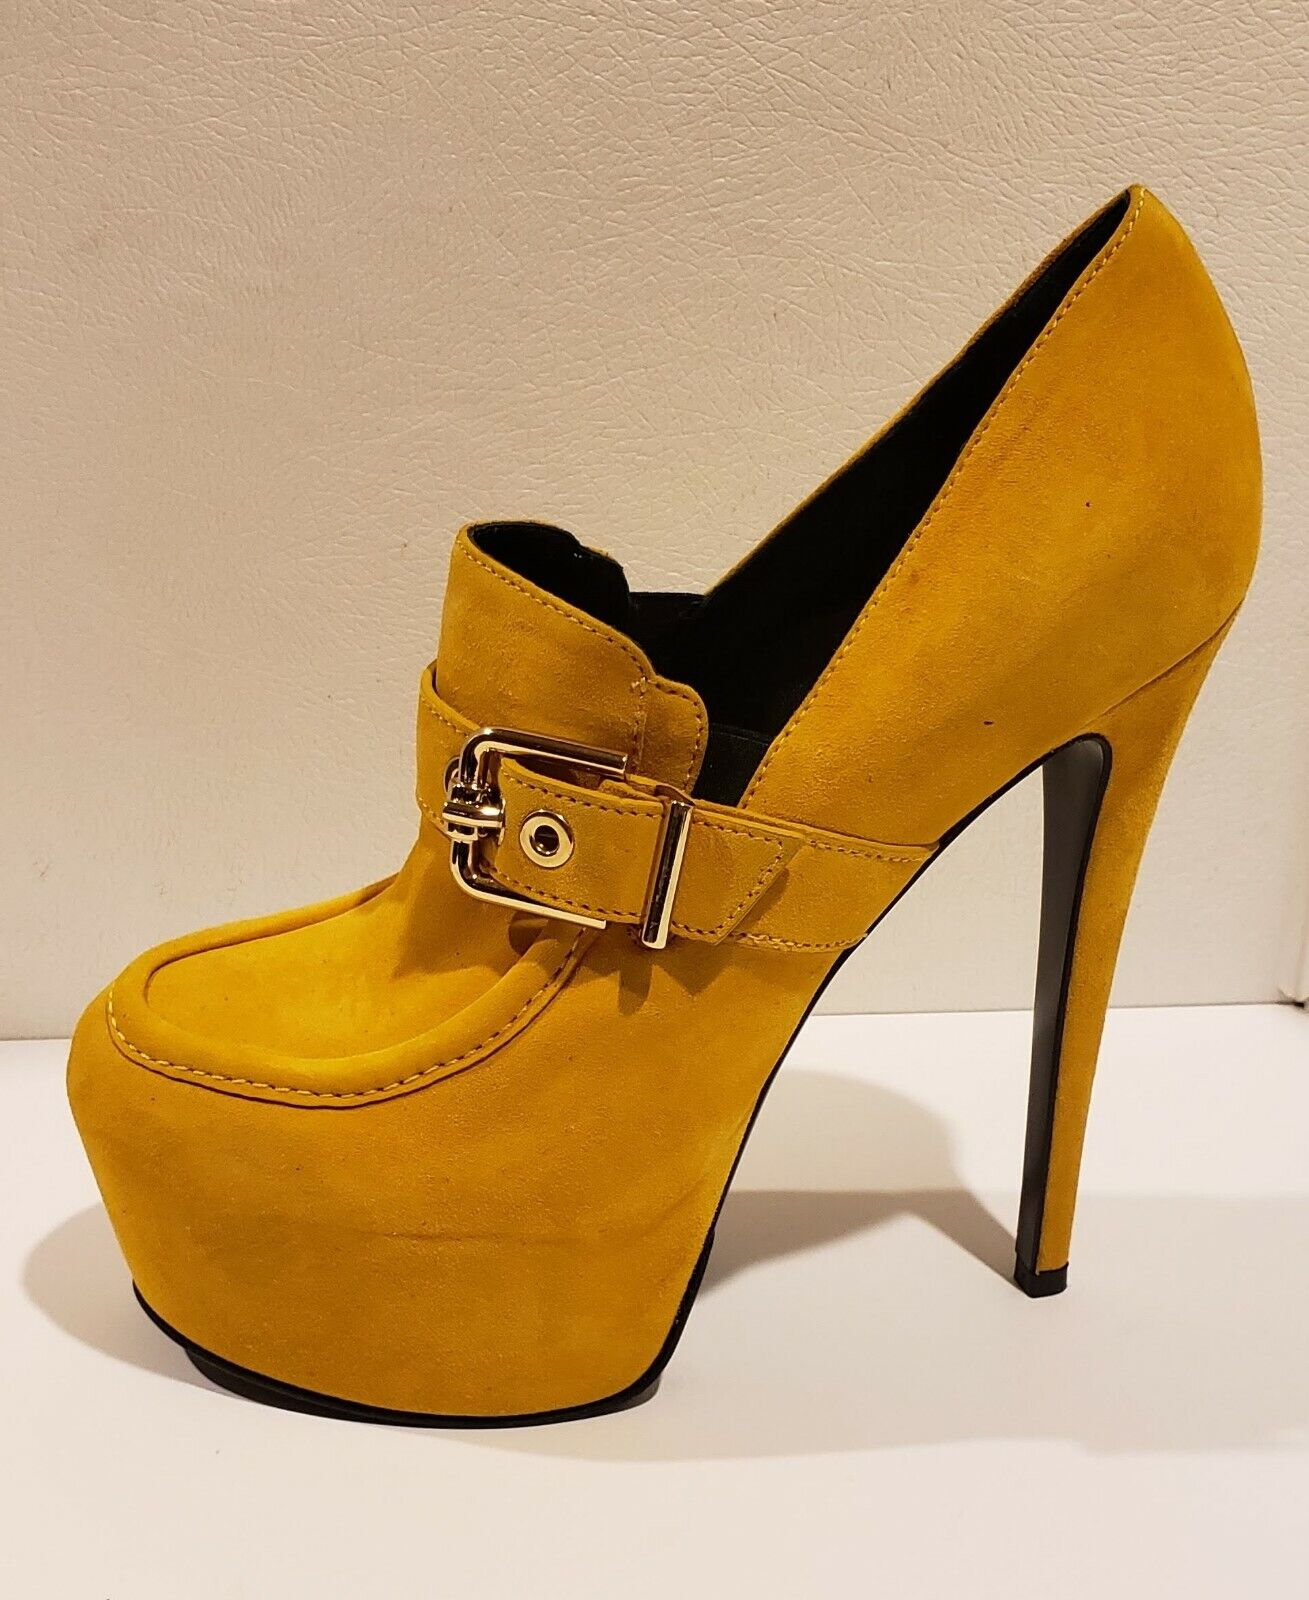 Fred Segal Feet Mayfair Mustard Yellow Suede Platform Buckle Stiletto Lofer  795